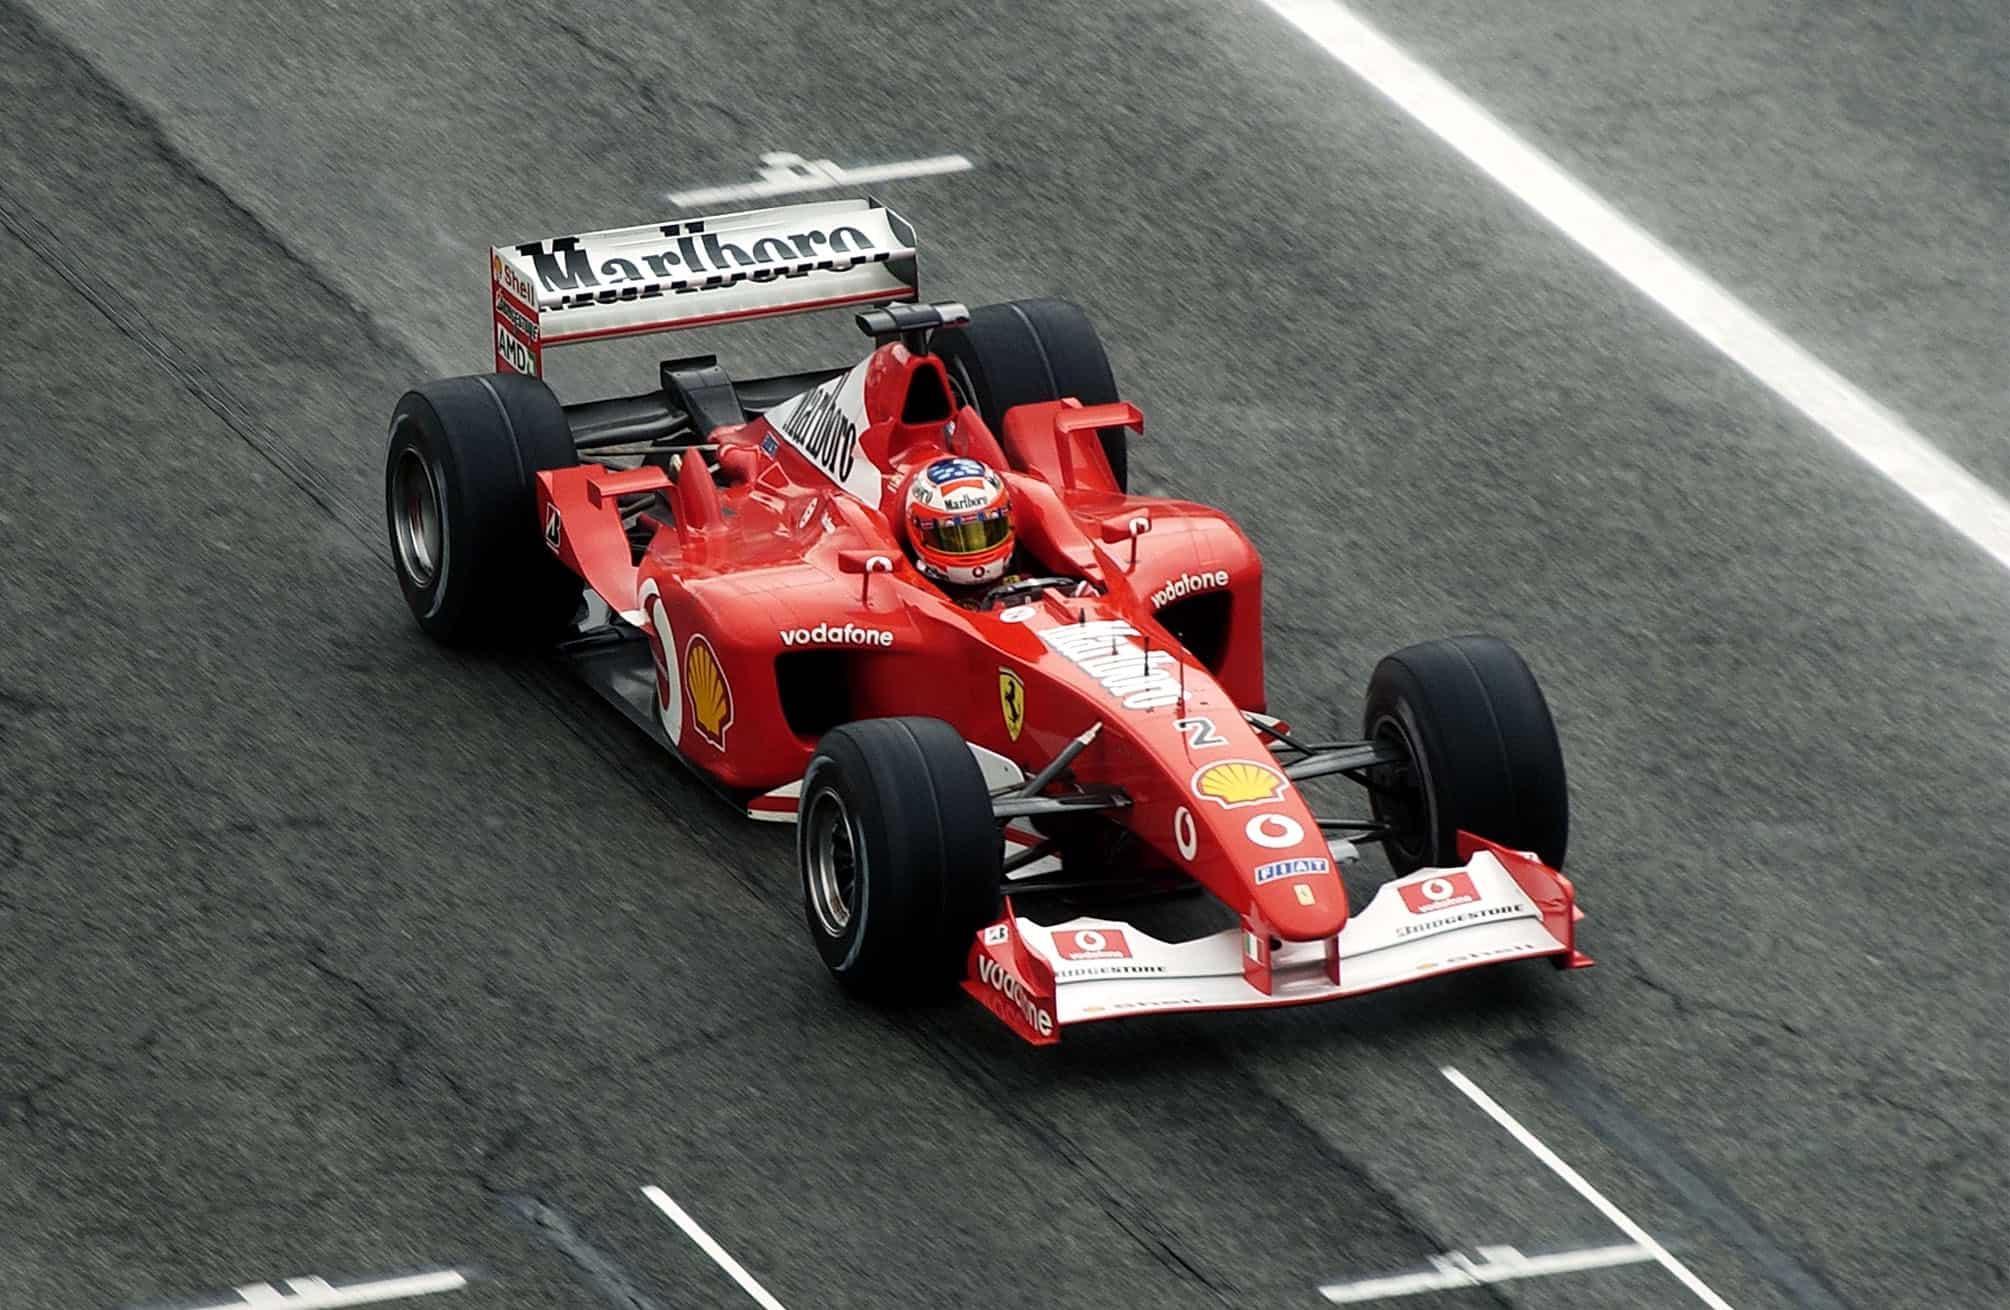 2002 F1 San Marino GP Imola Rubens Barrichello in the wet Photo Ferrari